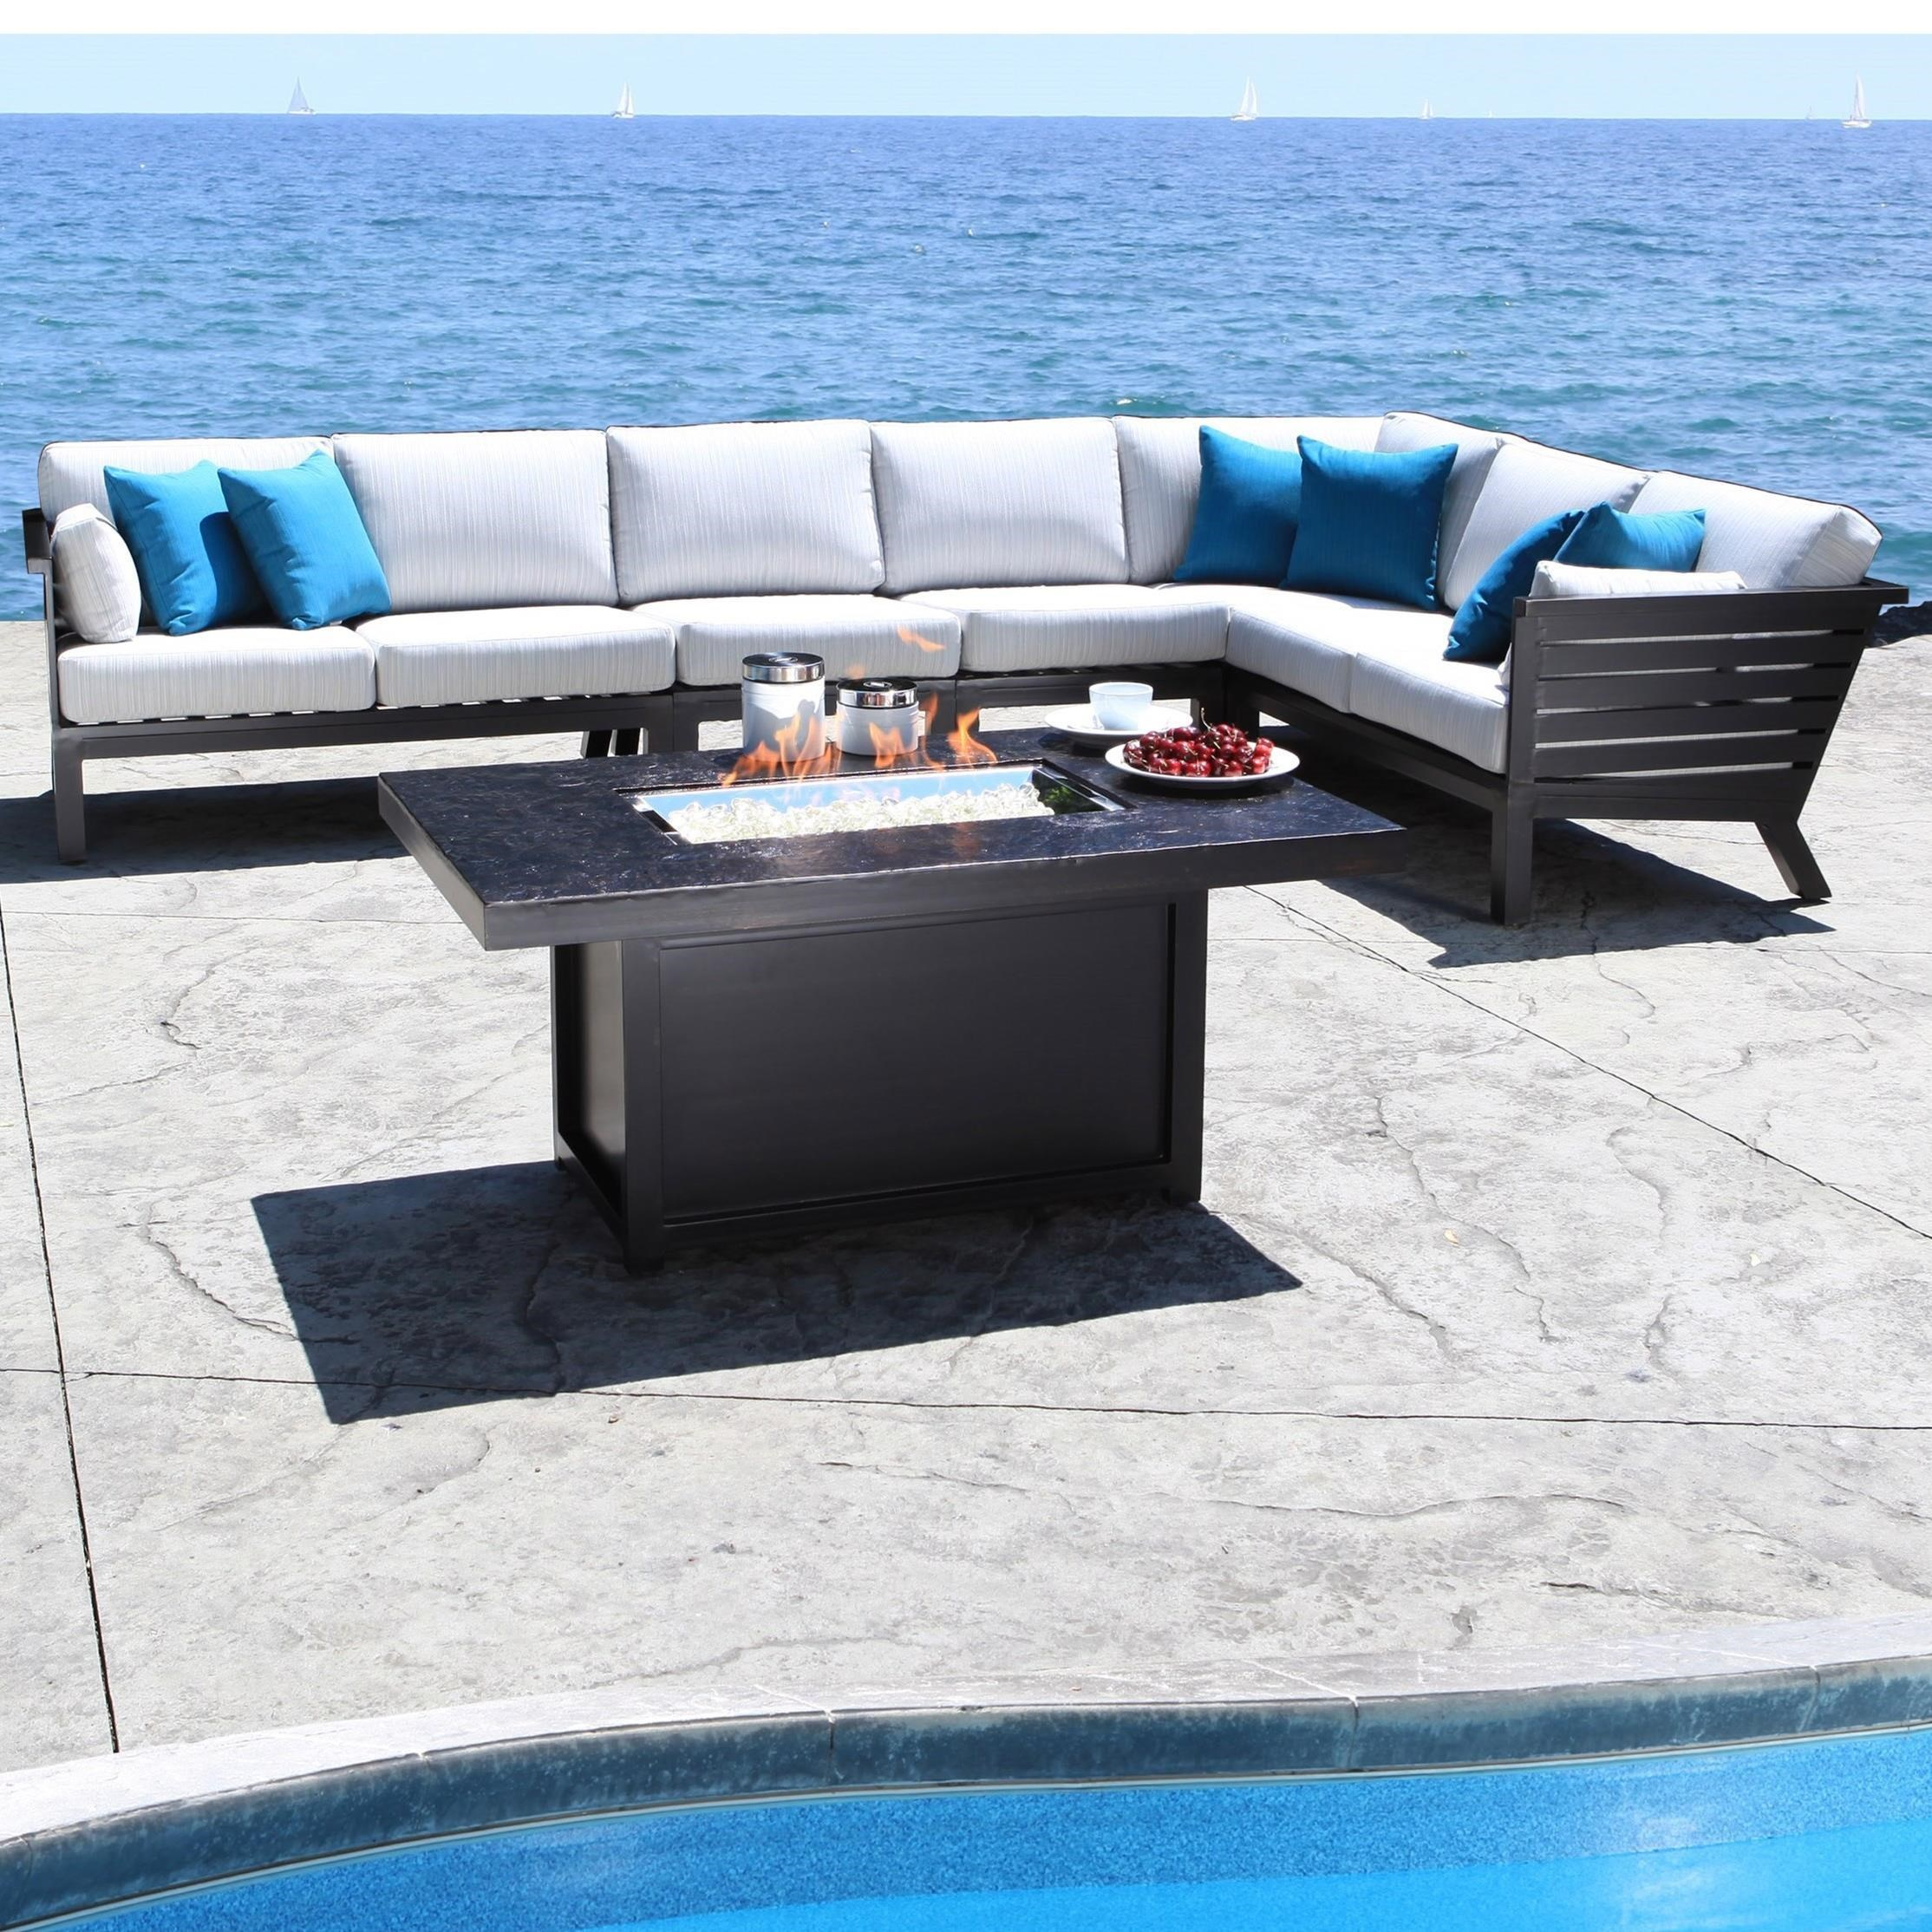 Cabana Coast Apex 5 Piece Contemporary Outdoor Sectional   Hudsonu0027s  Furniture   Outdoor Sectional Sofa Group